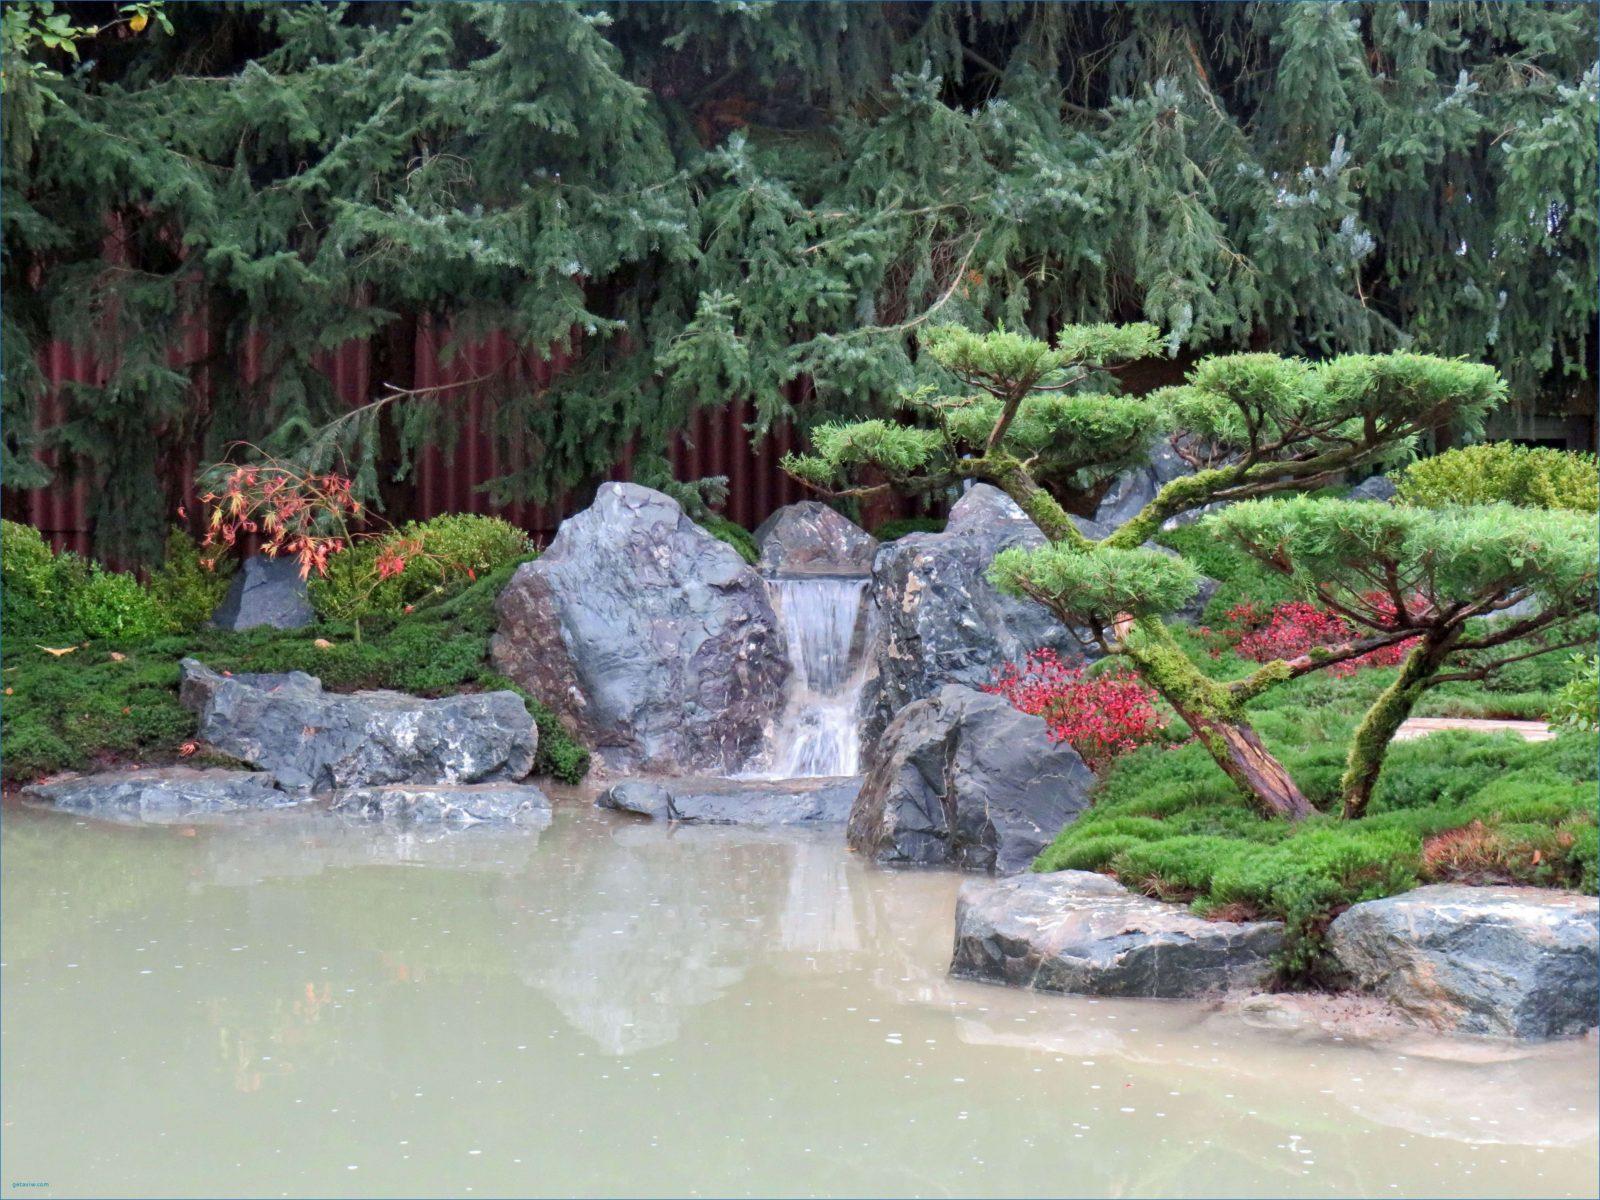 Wasserfall Garten Bauen Anleitung Schön Wasserfall Selber Bauen von Wasserfall Garten Bauen Anleitung Bild